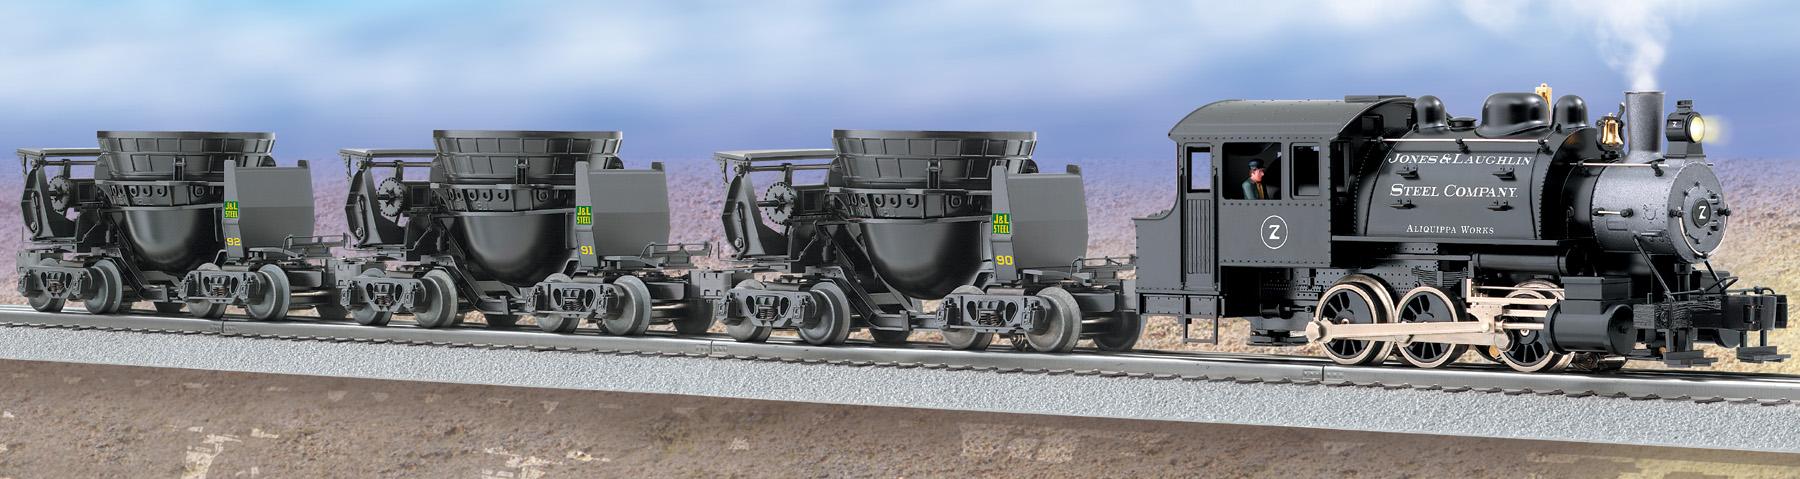 products jones laughlin steel slag train loco